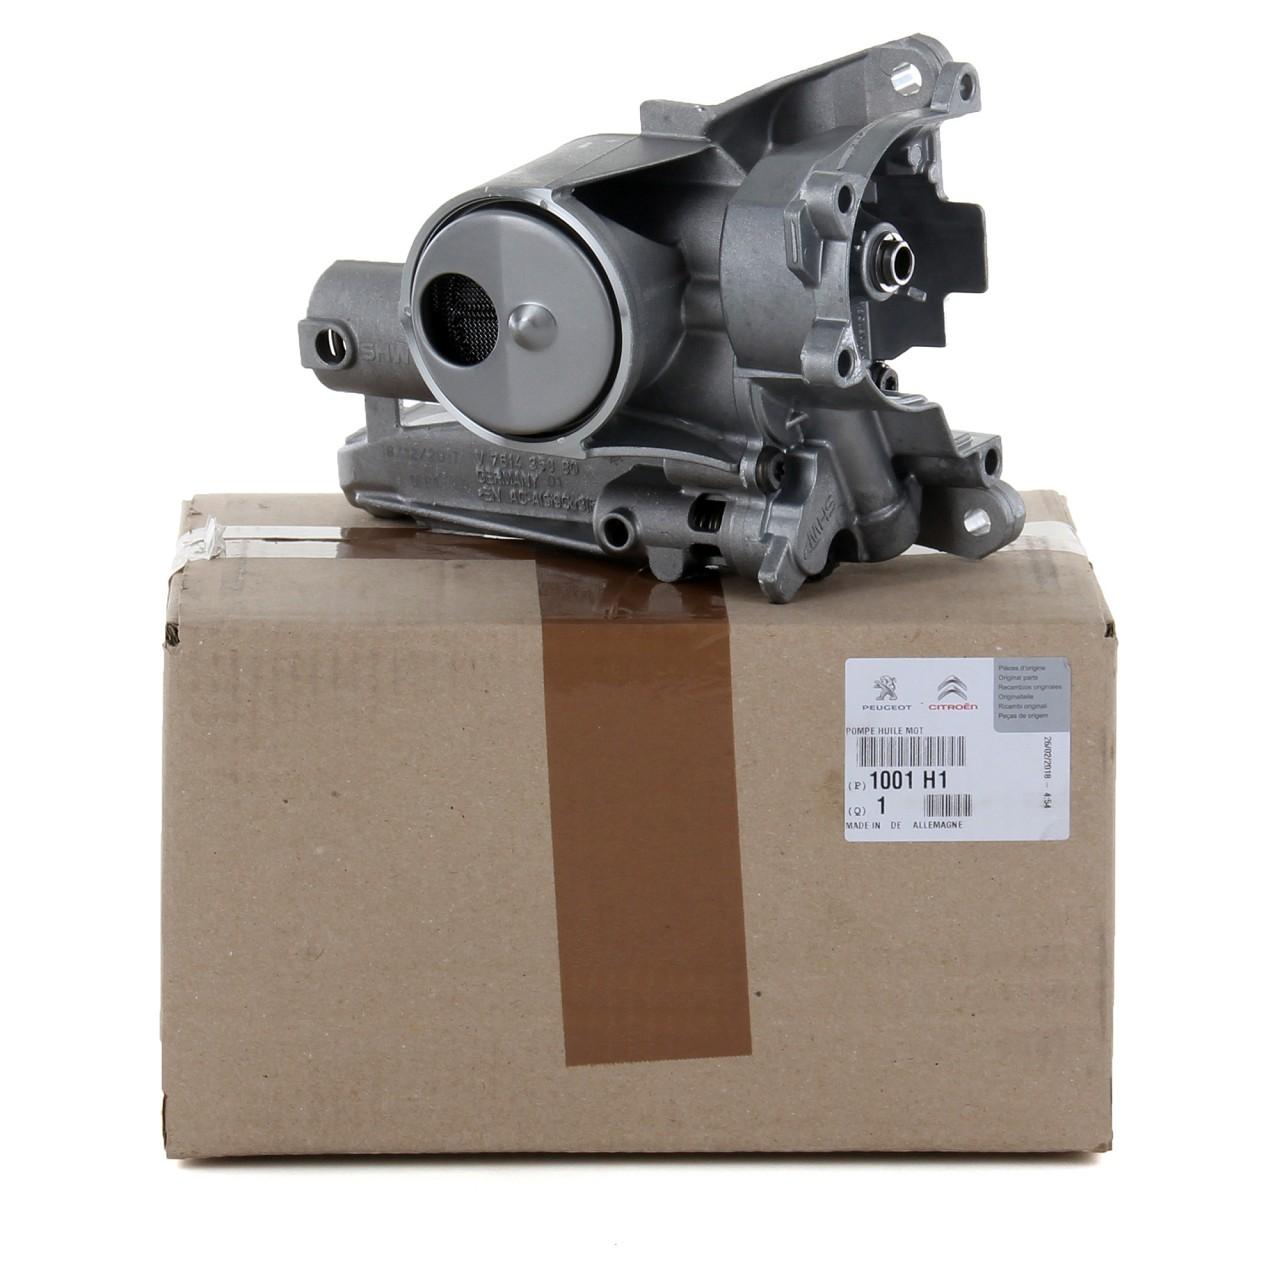 ORIGINAL Citroen Peugeot Ölpumpe C3 PICASSO C4 DS3 207 308 1.4 1.6 1001.H1